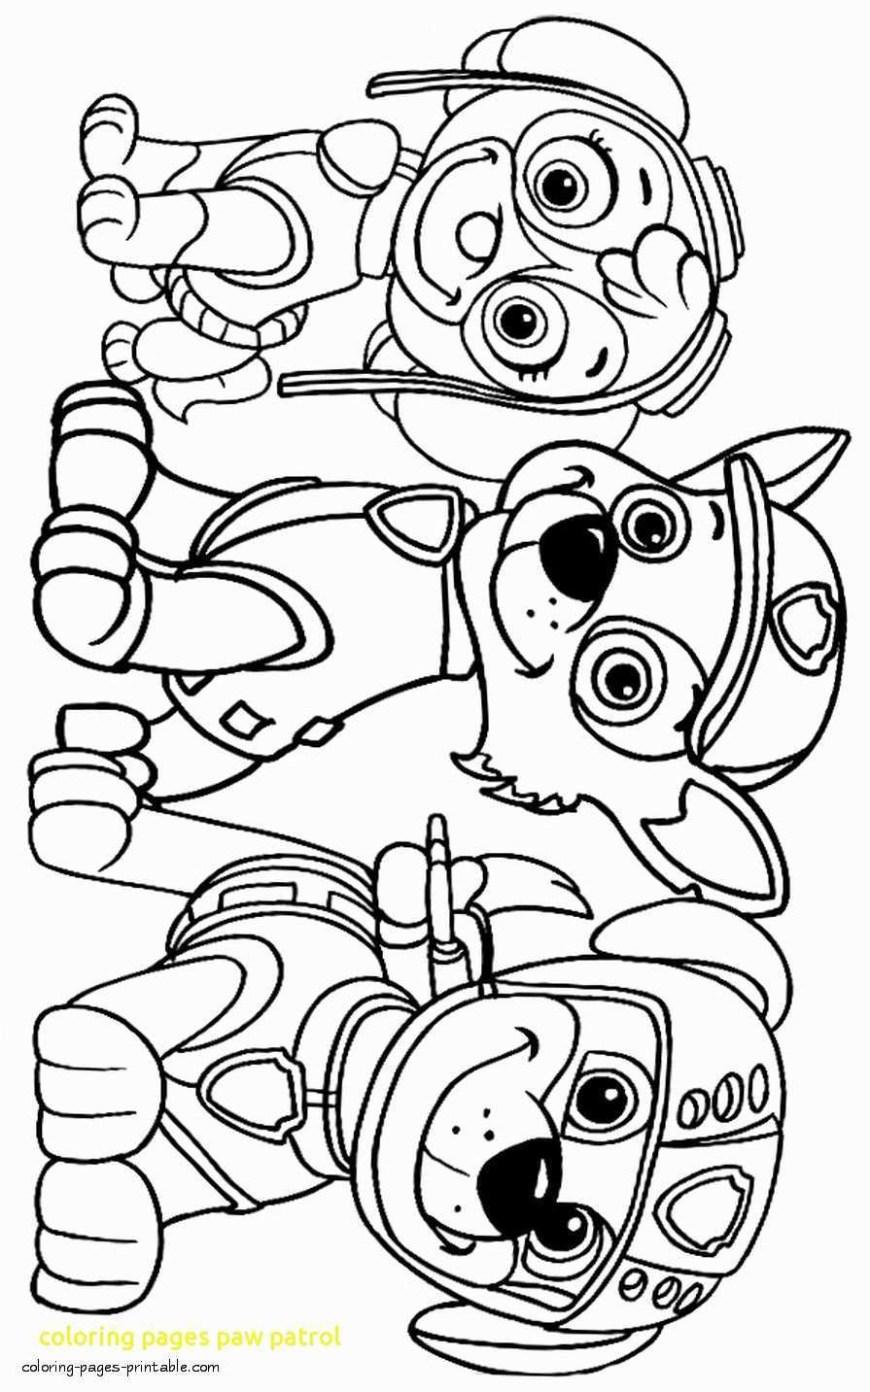 Printable Paw Patrol Coloring Pages Disney Jr Coloring Pages Printable Best Of Nick Jr Christmas